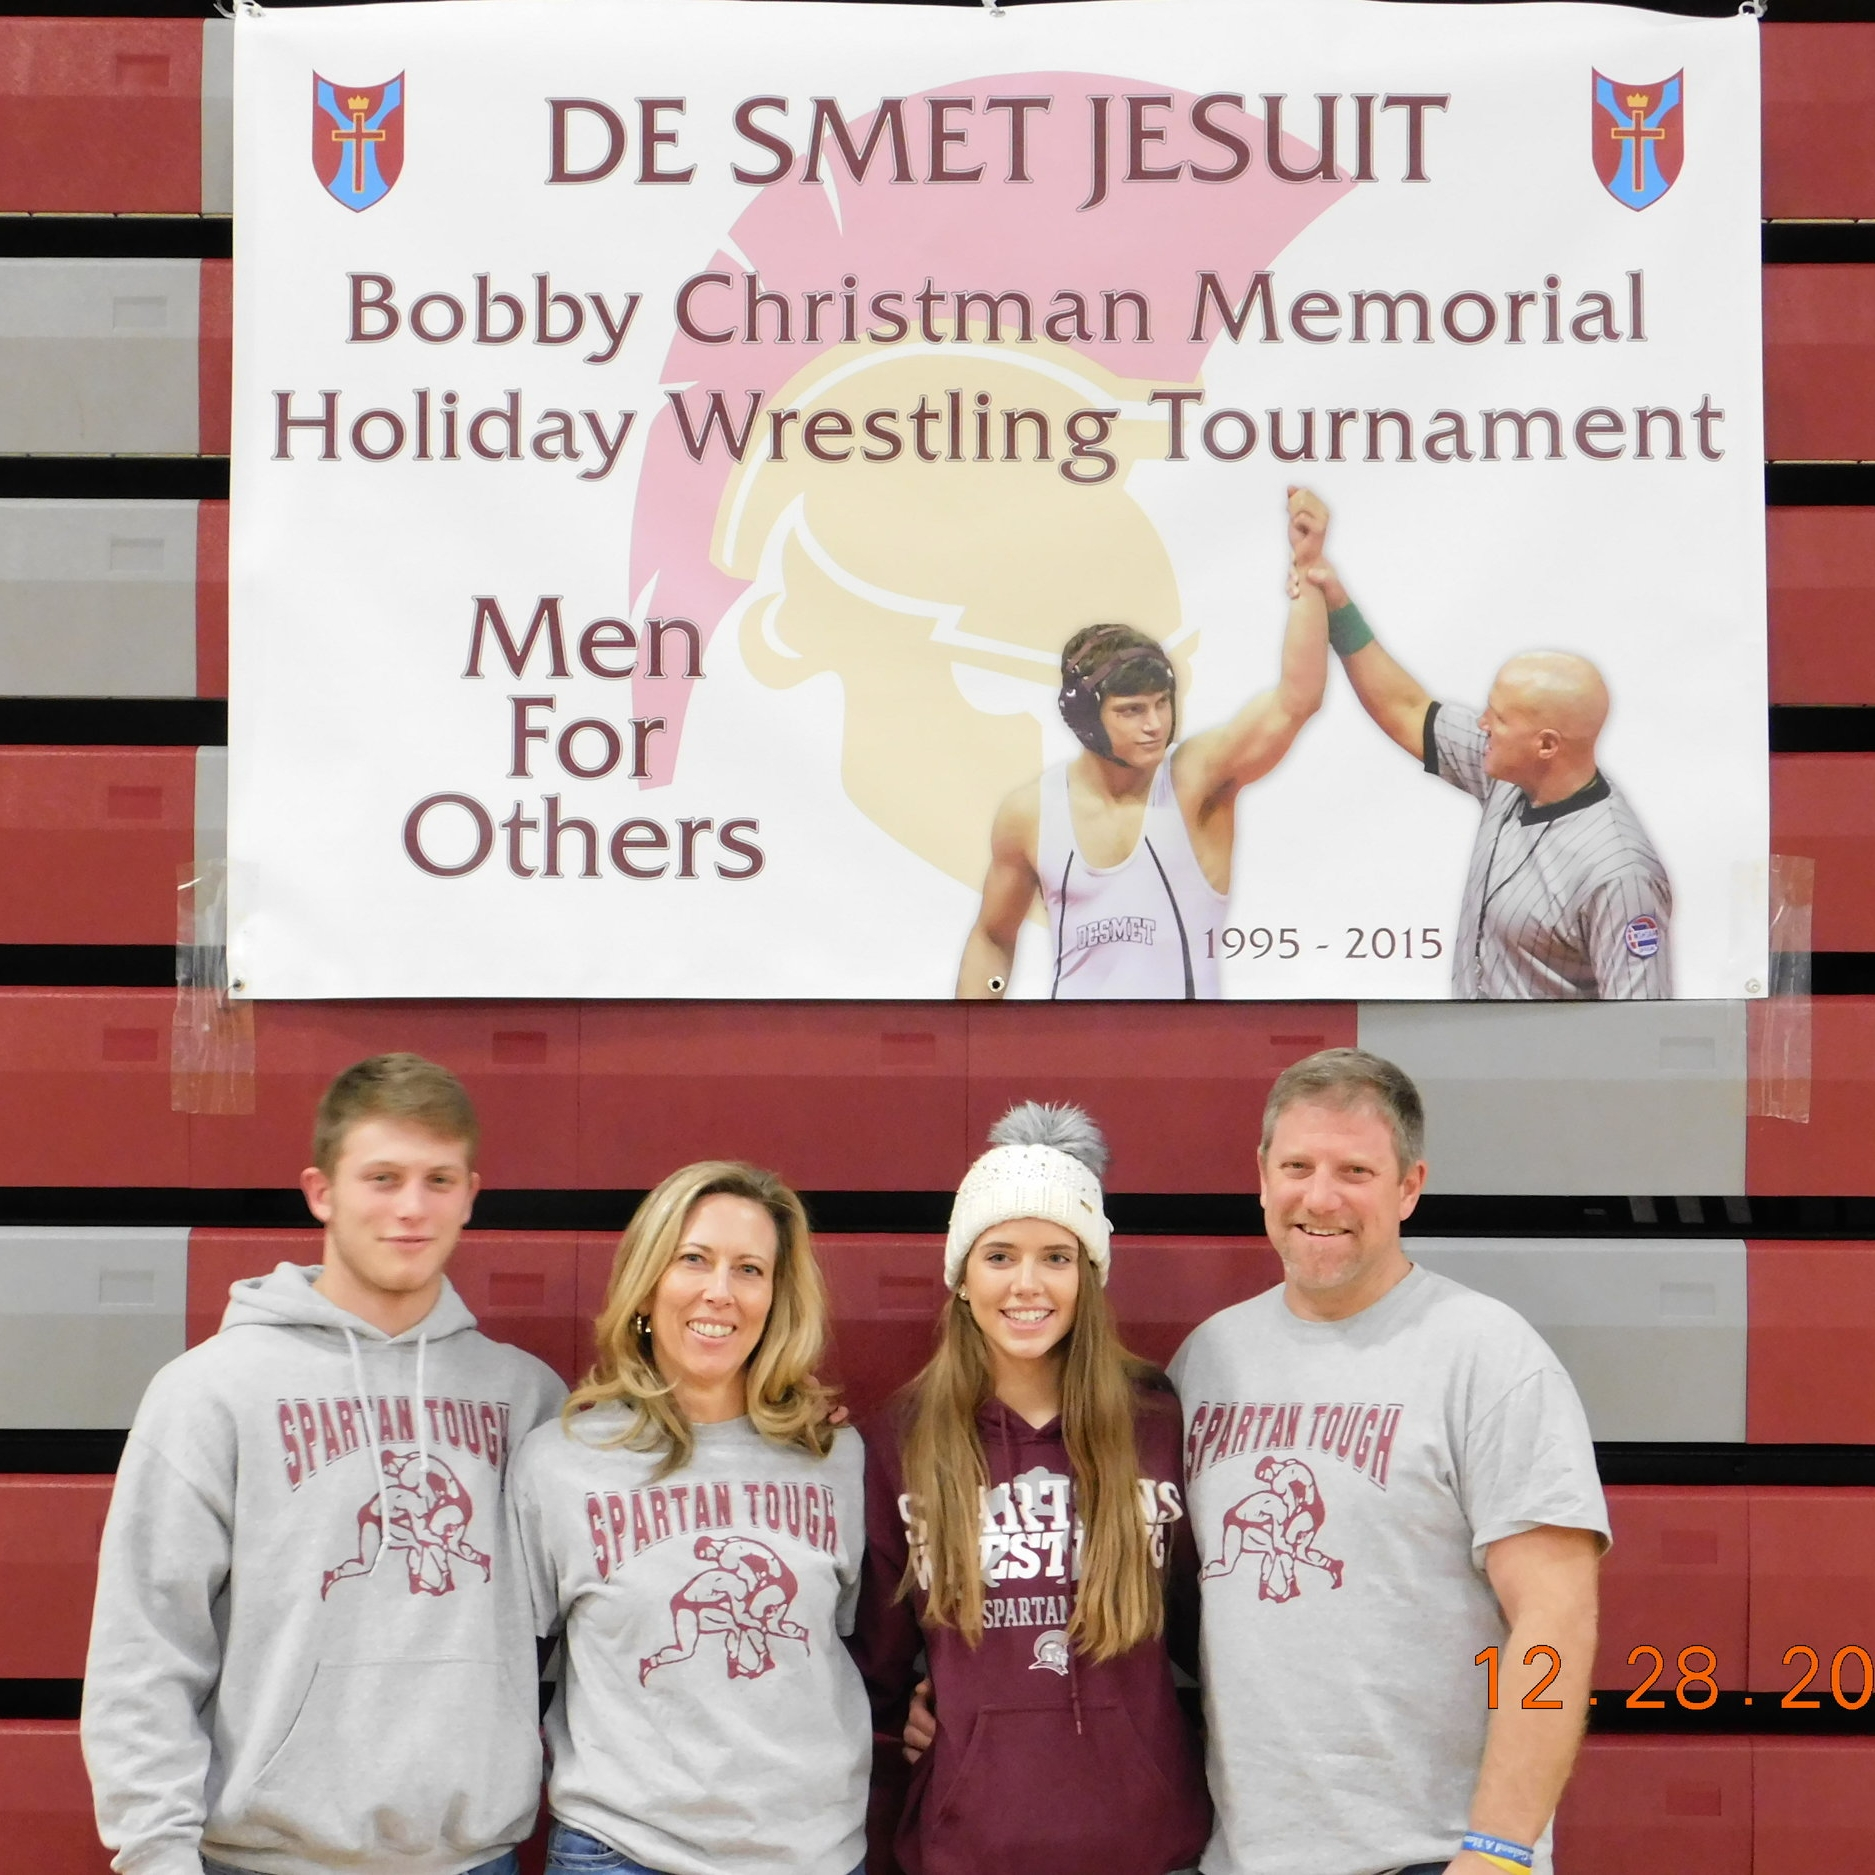 DeSmet Jesuit Bobby Christman Memorial Wrestling Tournament